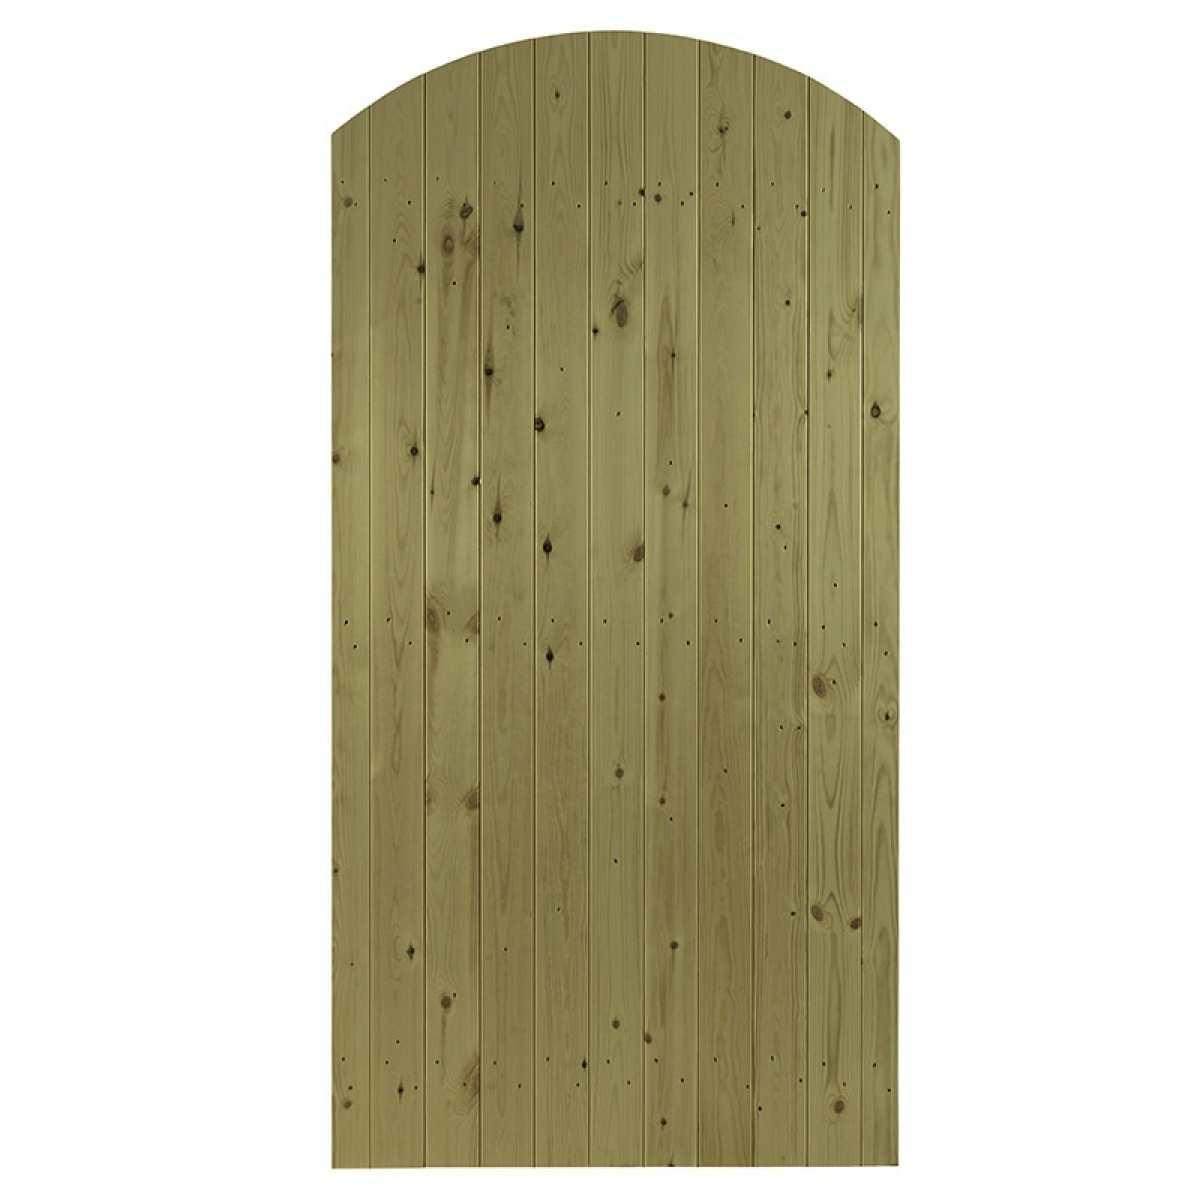 priory gate websterstimber Image by Websters Timber